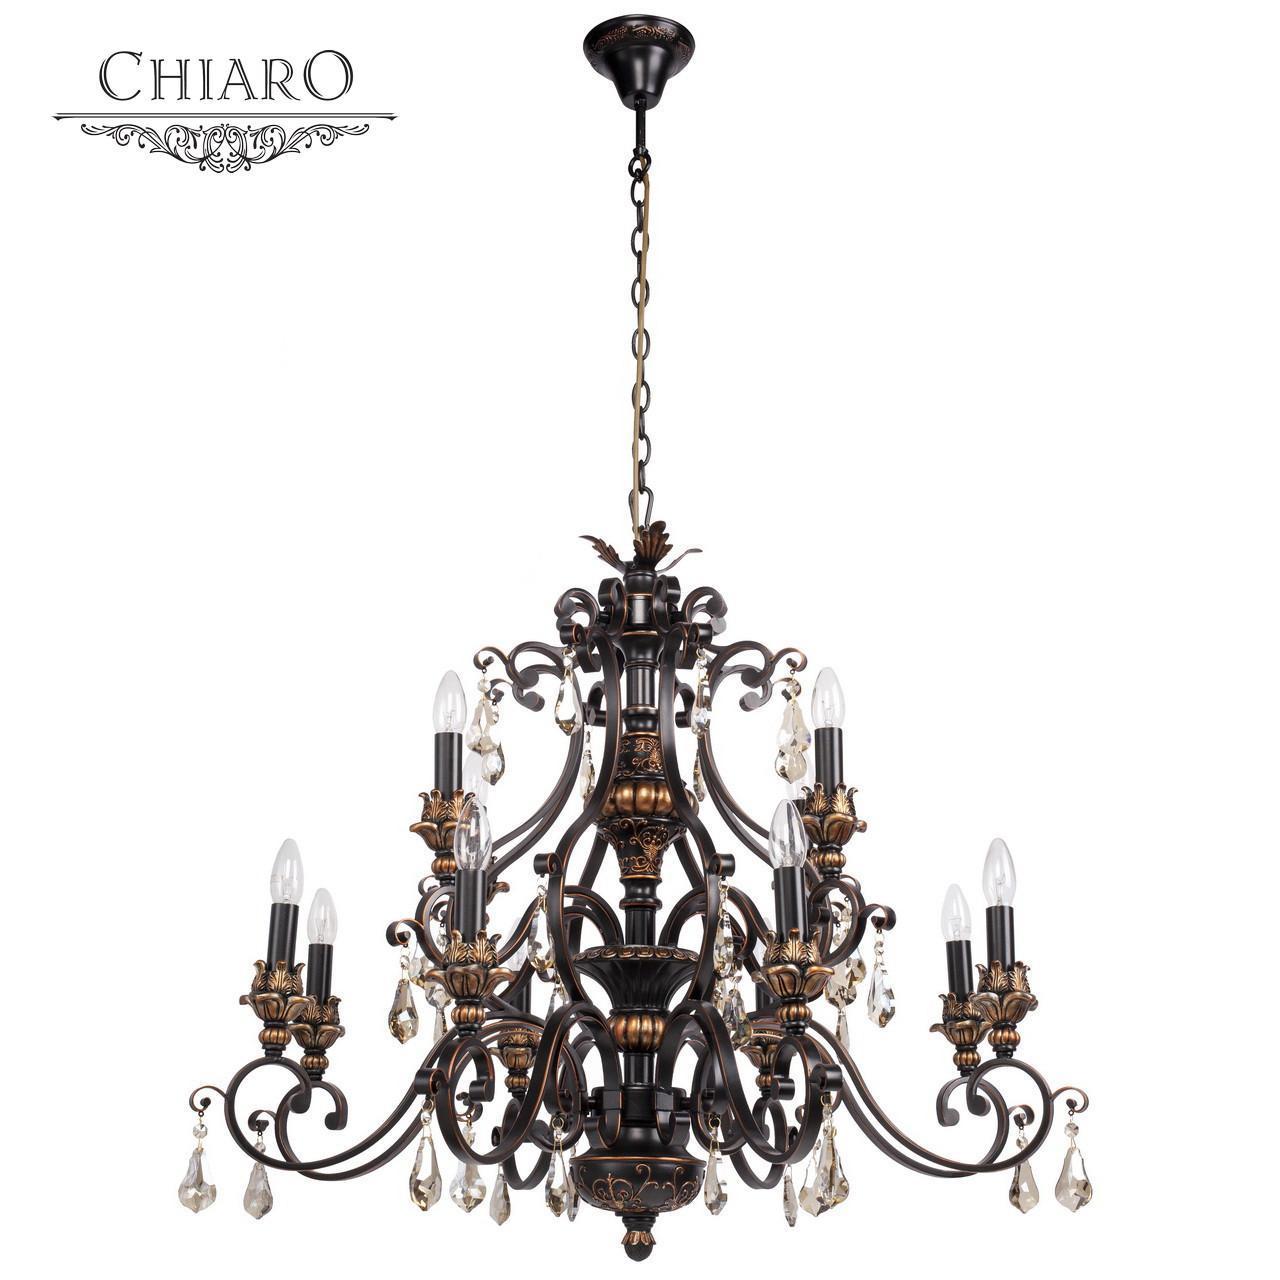 Подвесная люстра Chiaro Версаче 254018712 подвесная люстра chiaro версаче 639012712